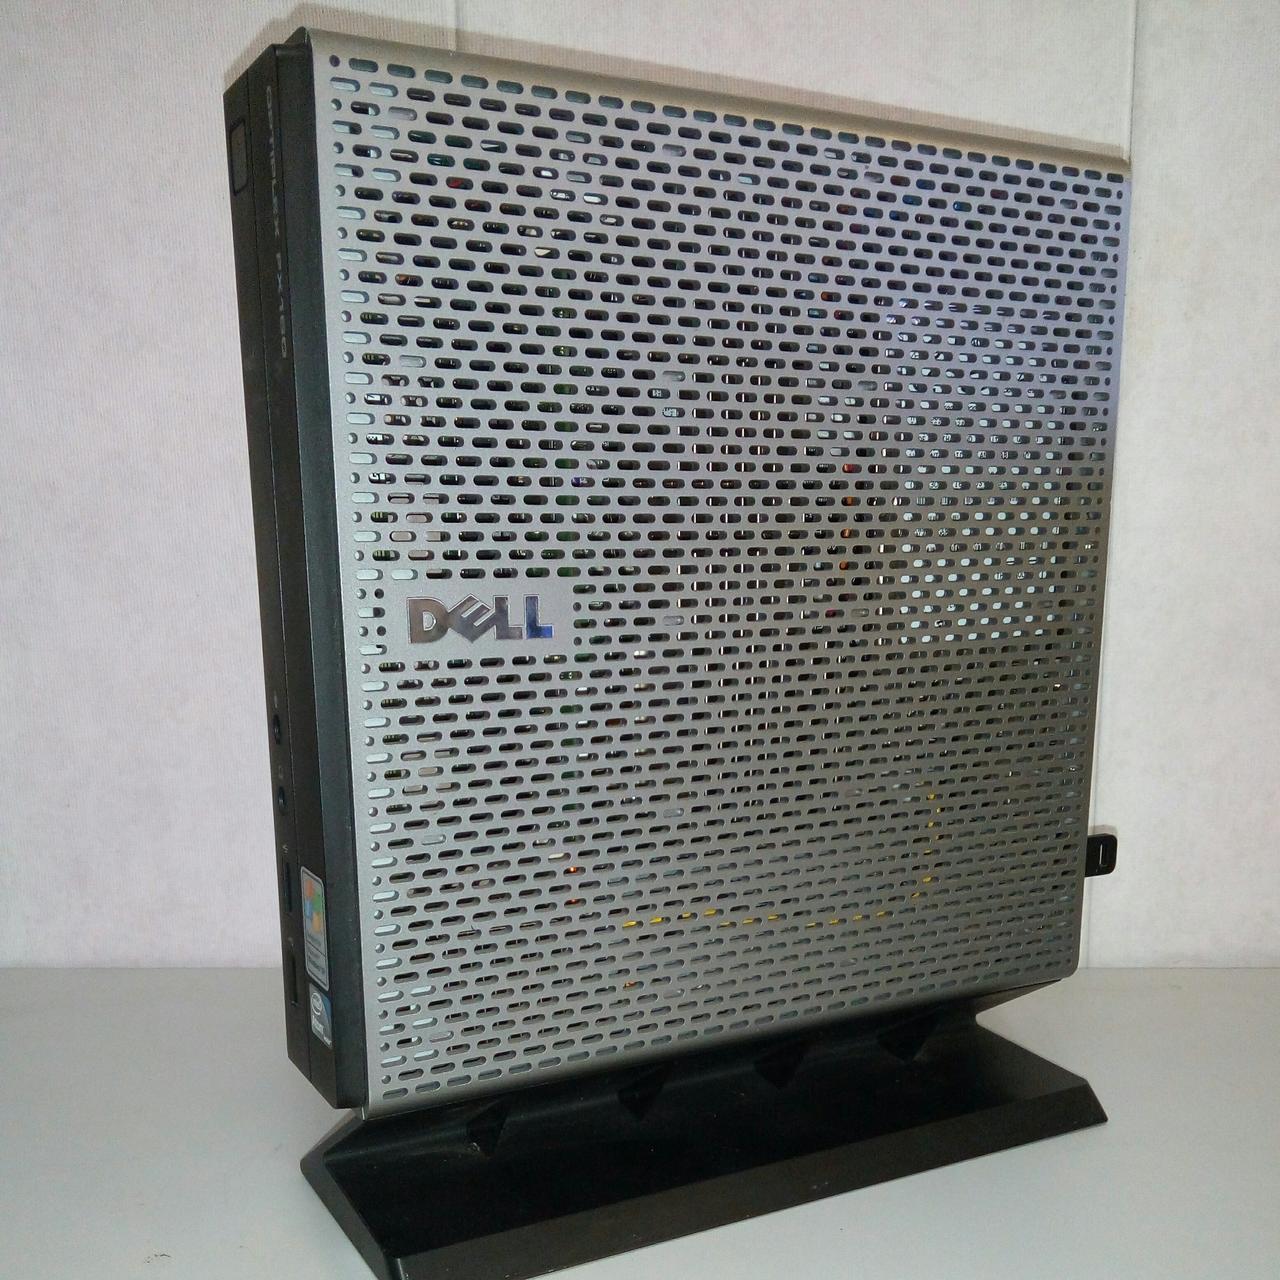 Неттоп DELL Optiplex FX160 Intel AtomTM 230 1,6 ГГц ( 2 потока)/320Gb